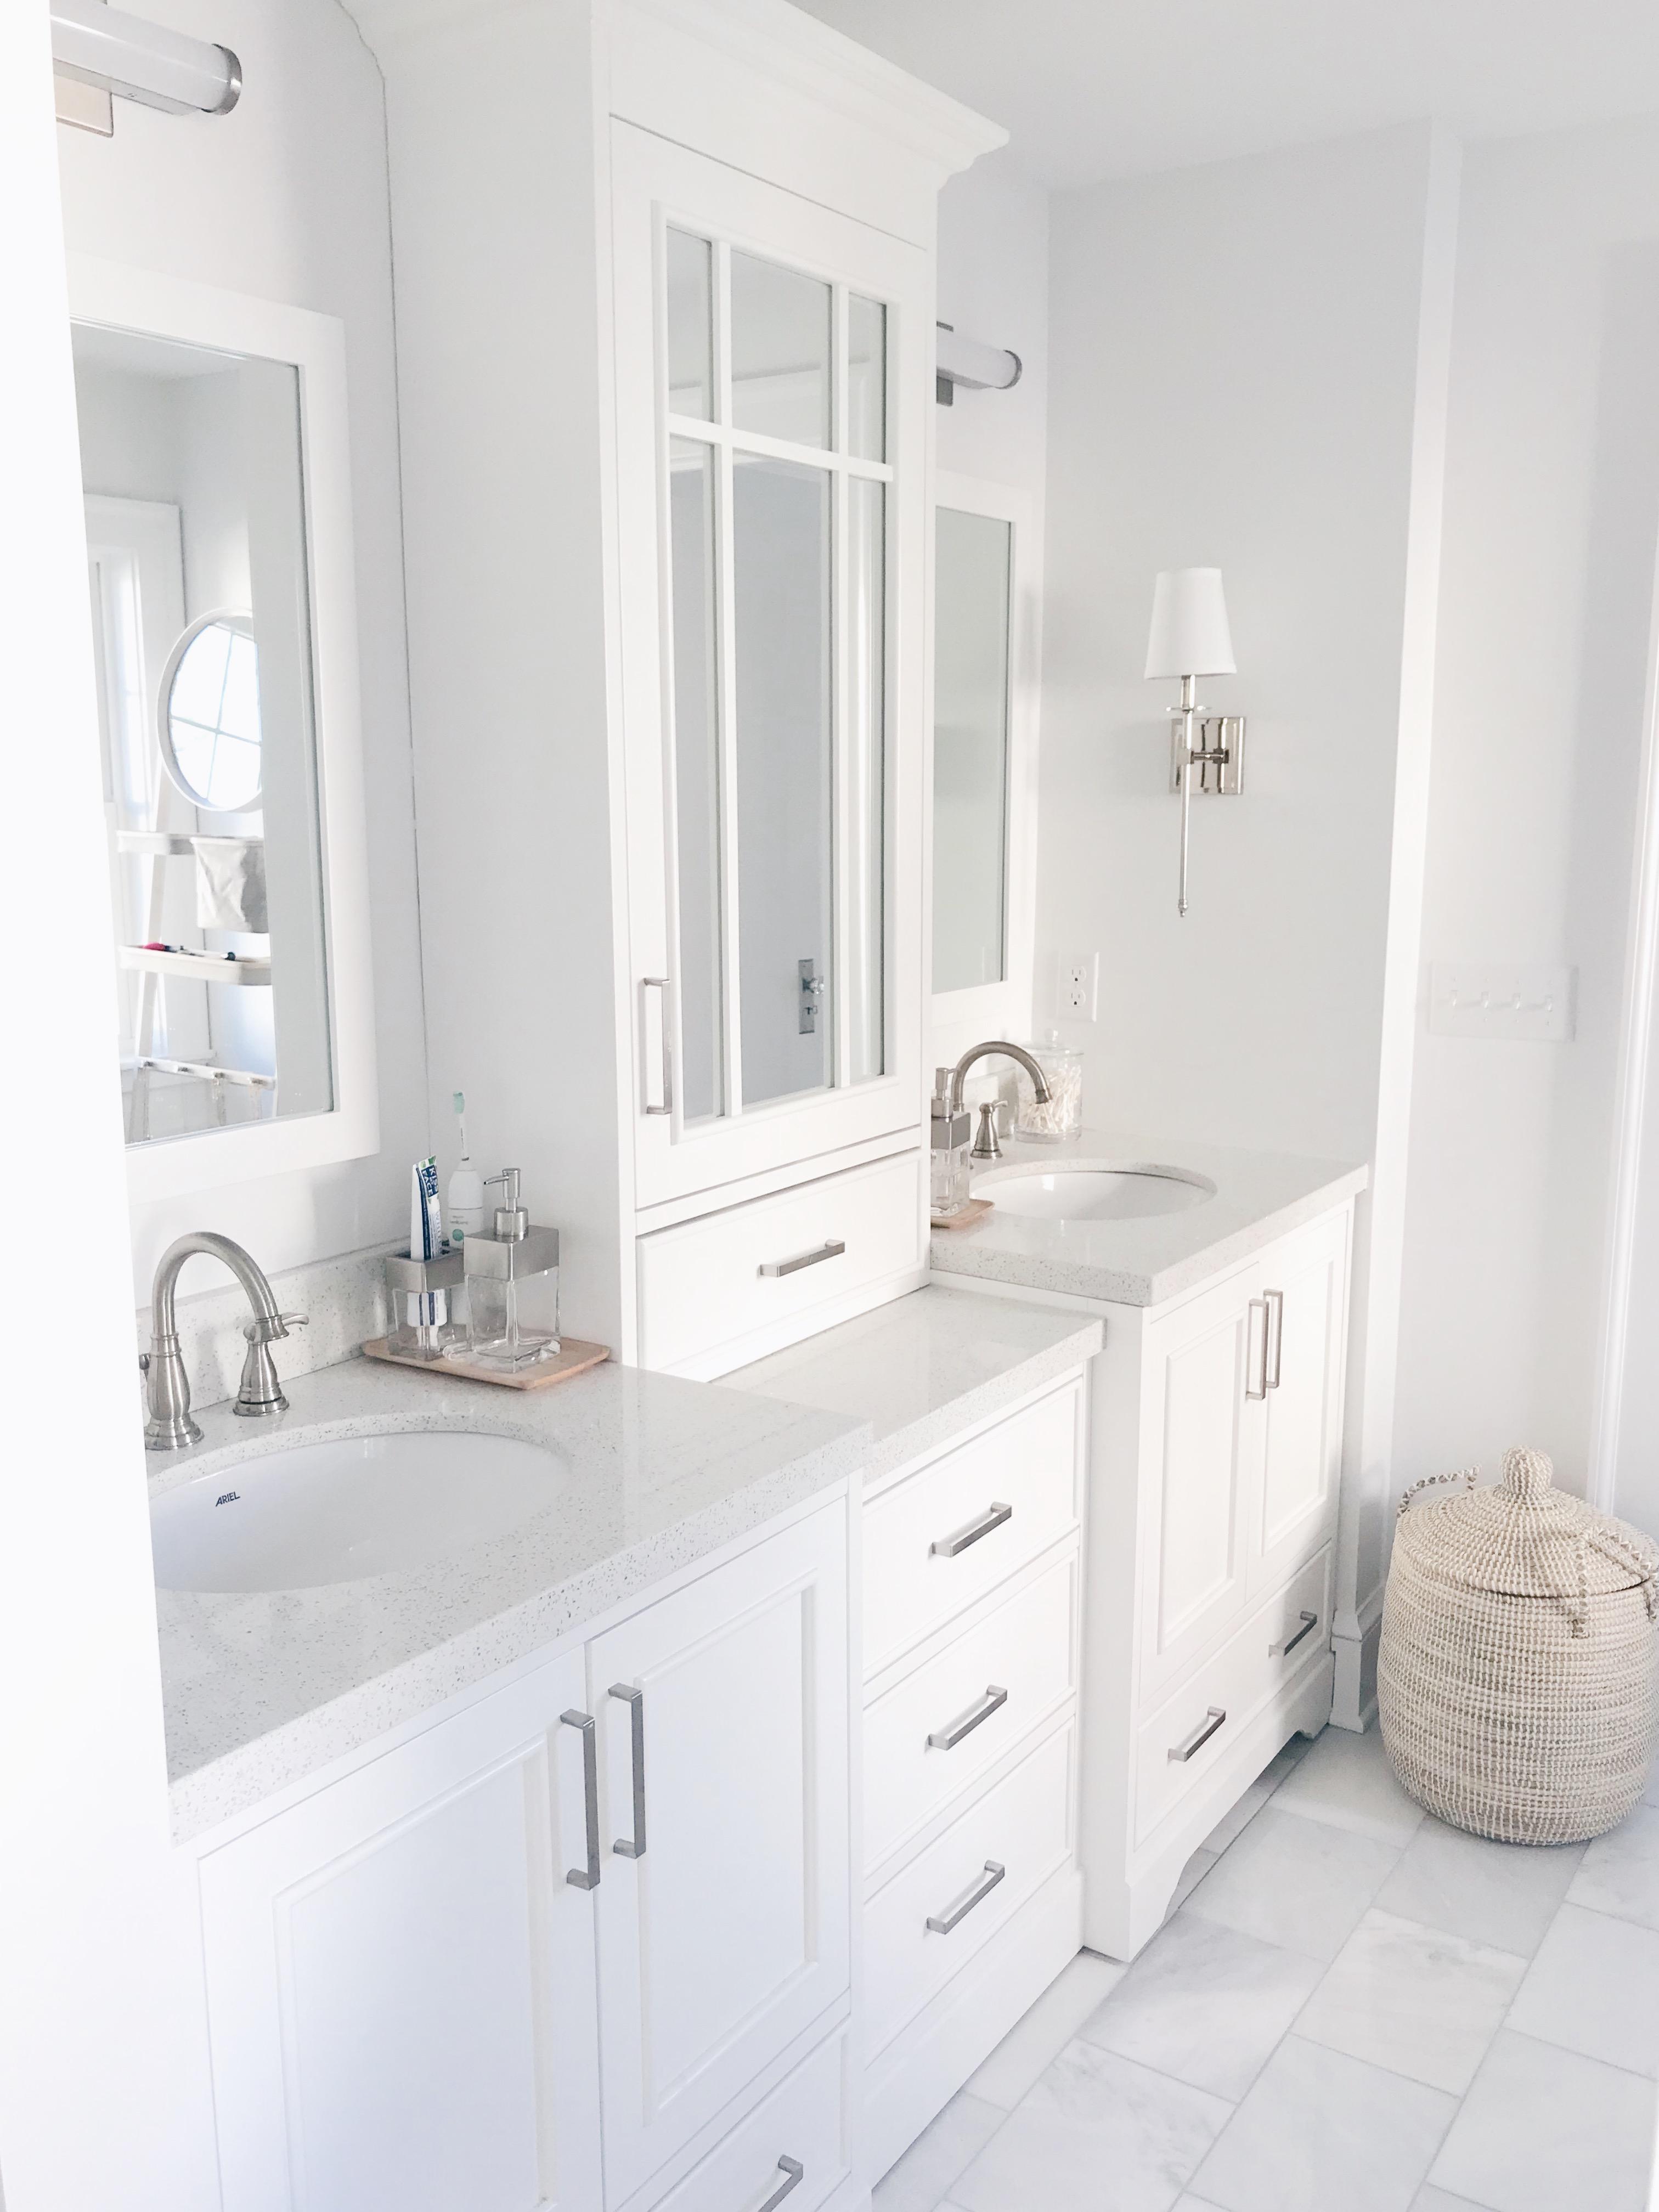 custom look white vanity with tower under $3,000 on pinteresting plans blog